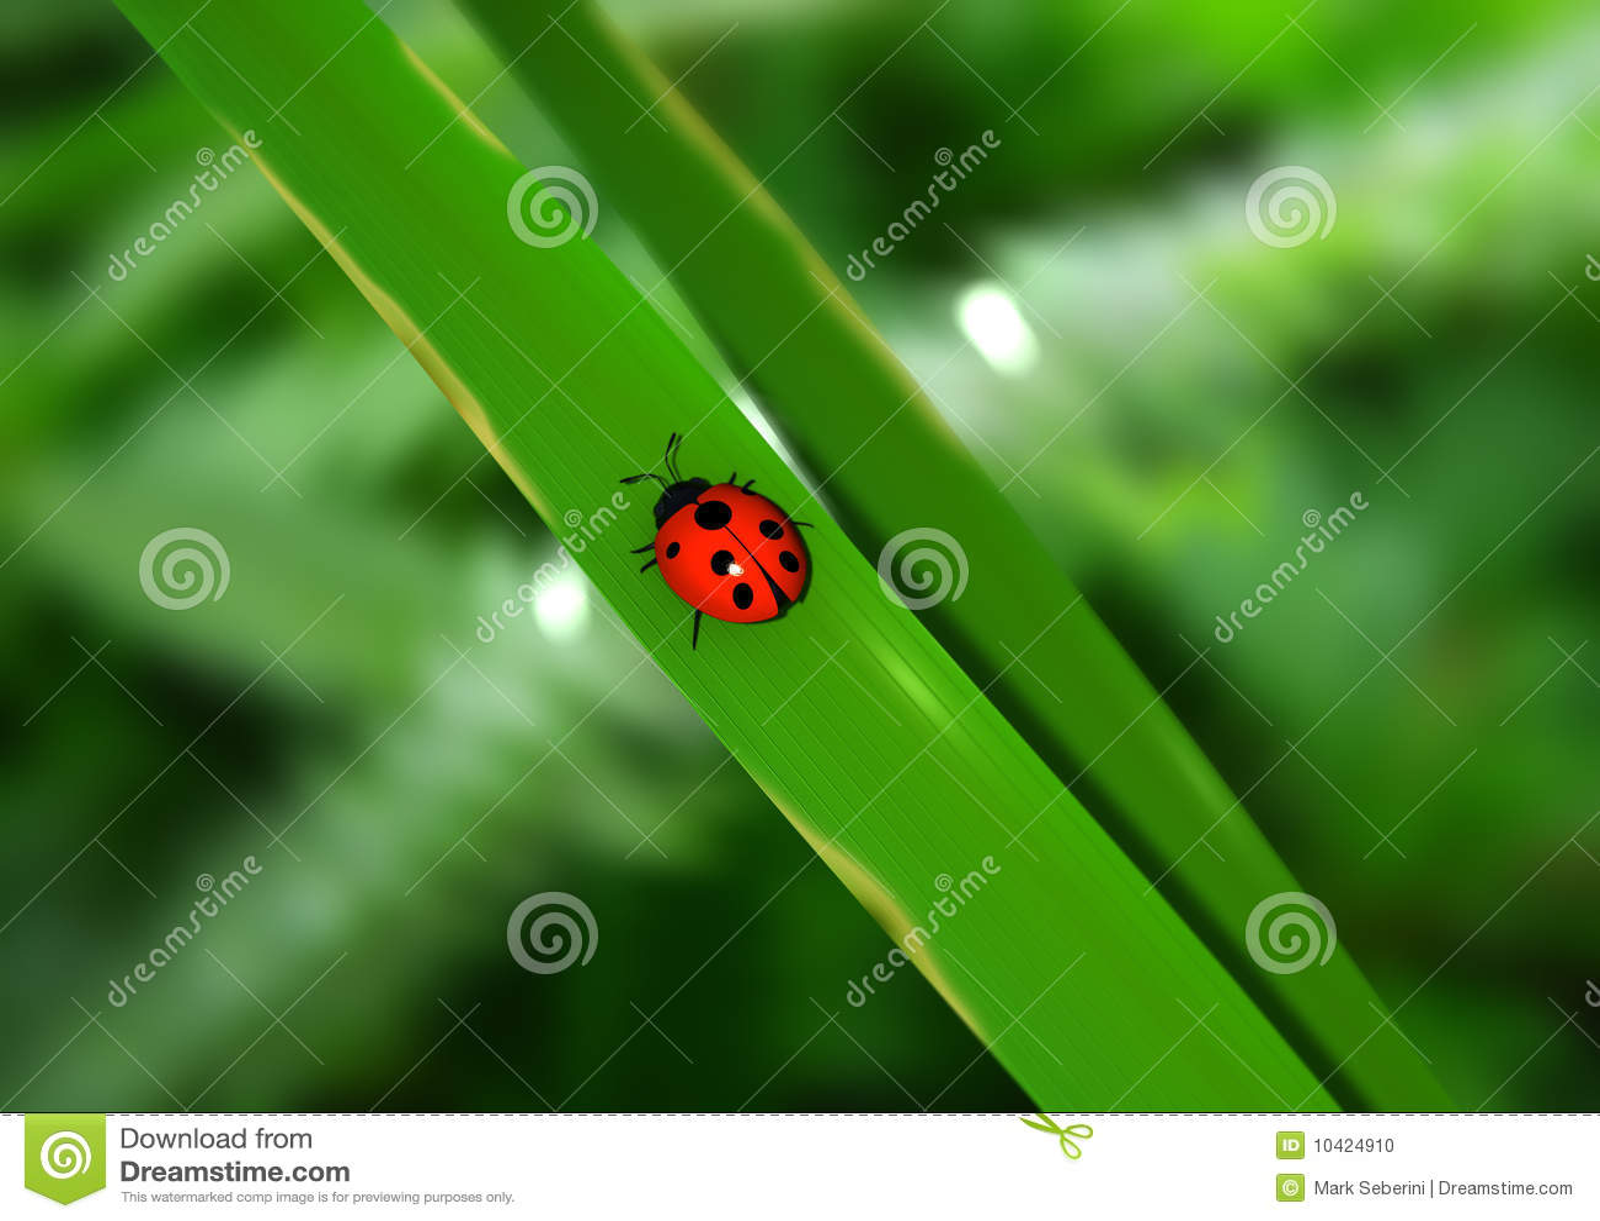 Señora Bug